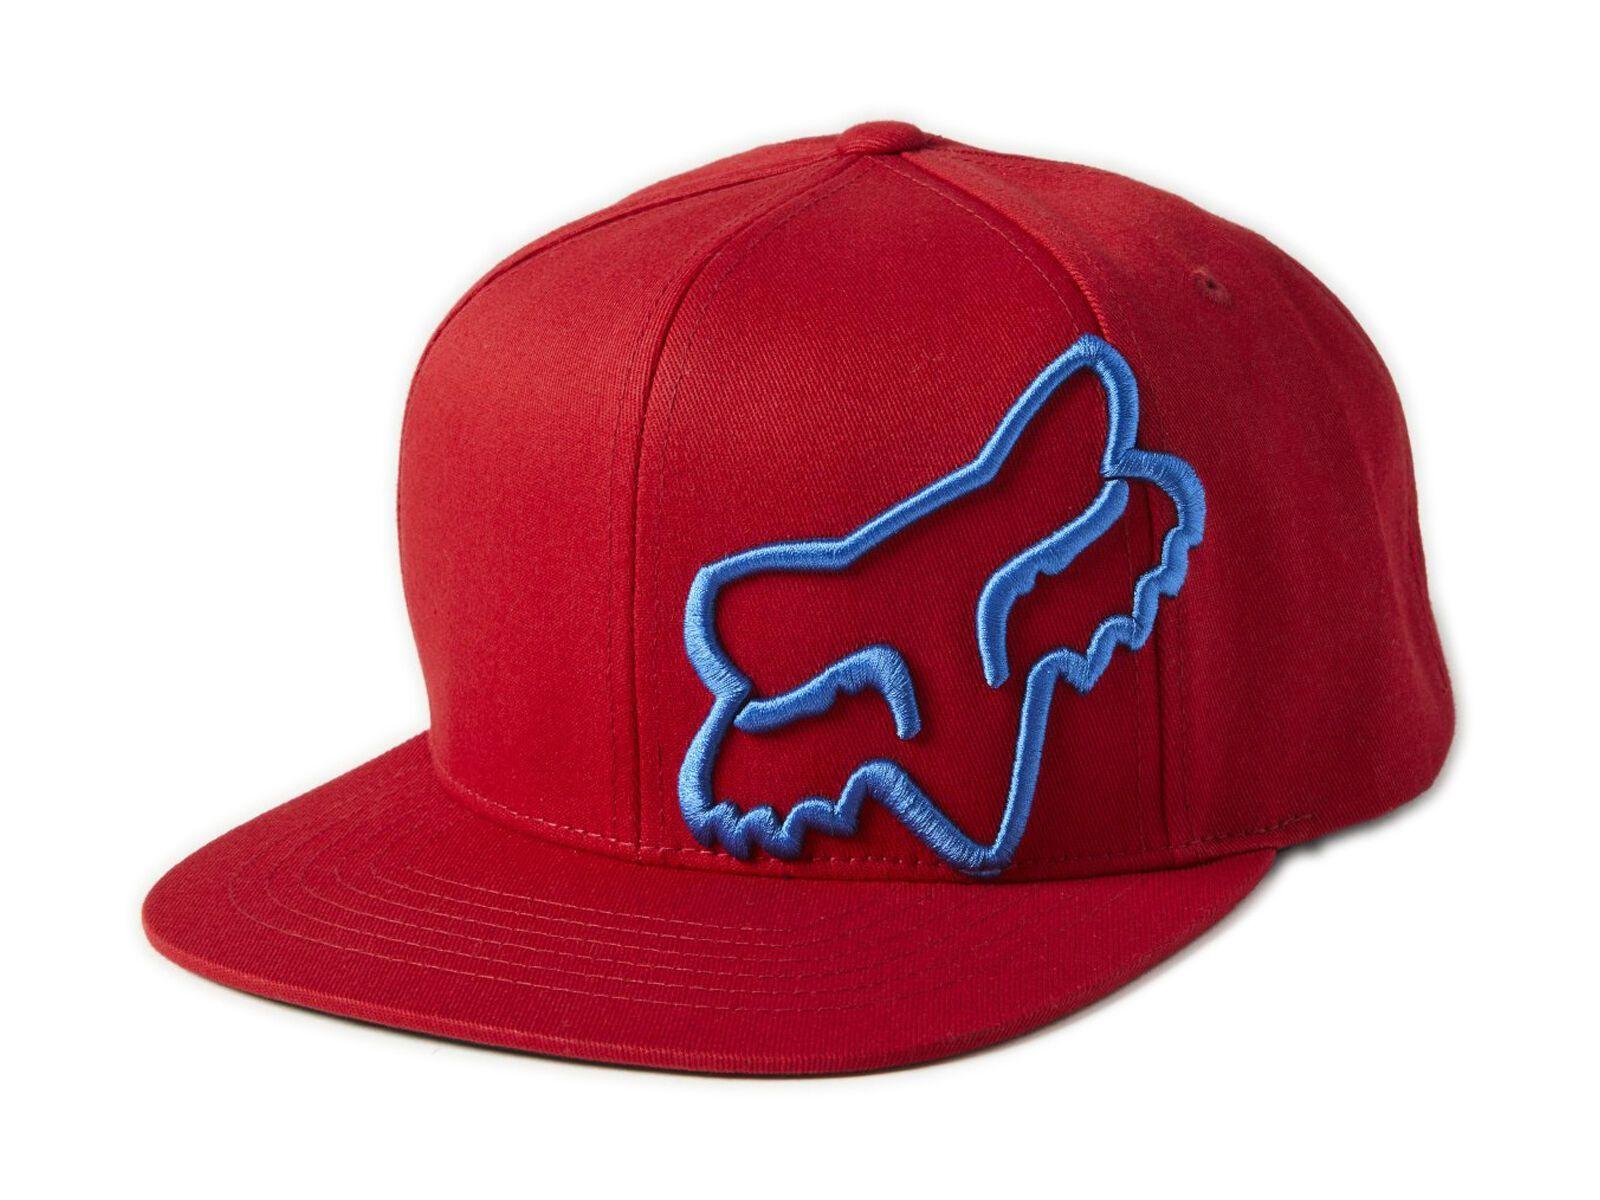 Fox Headers Snapback Hat red 24948-003-OS